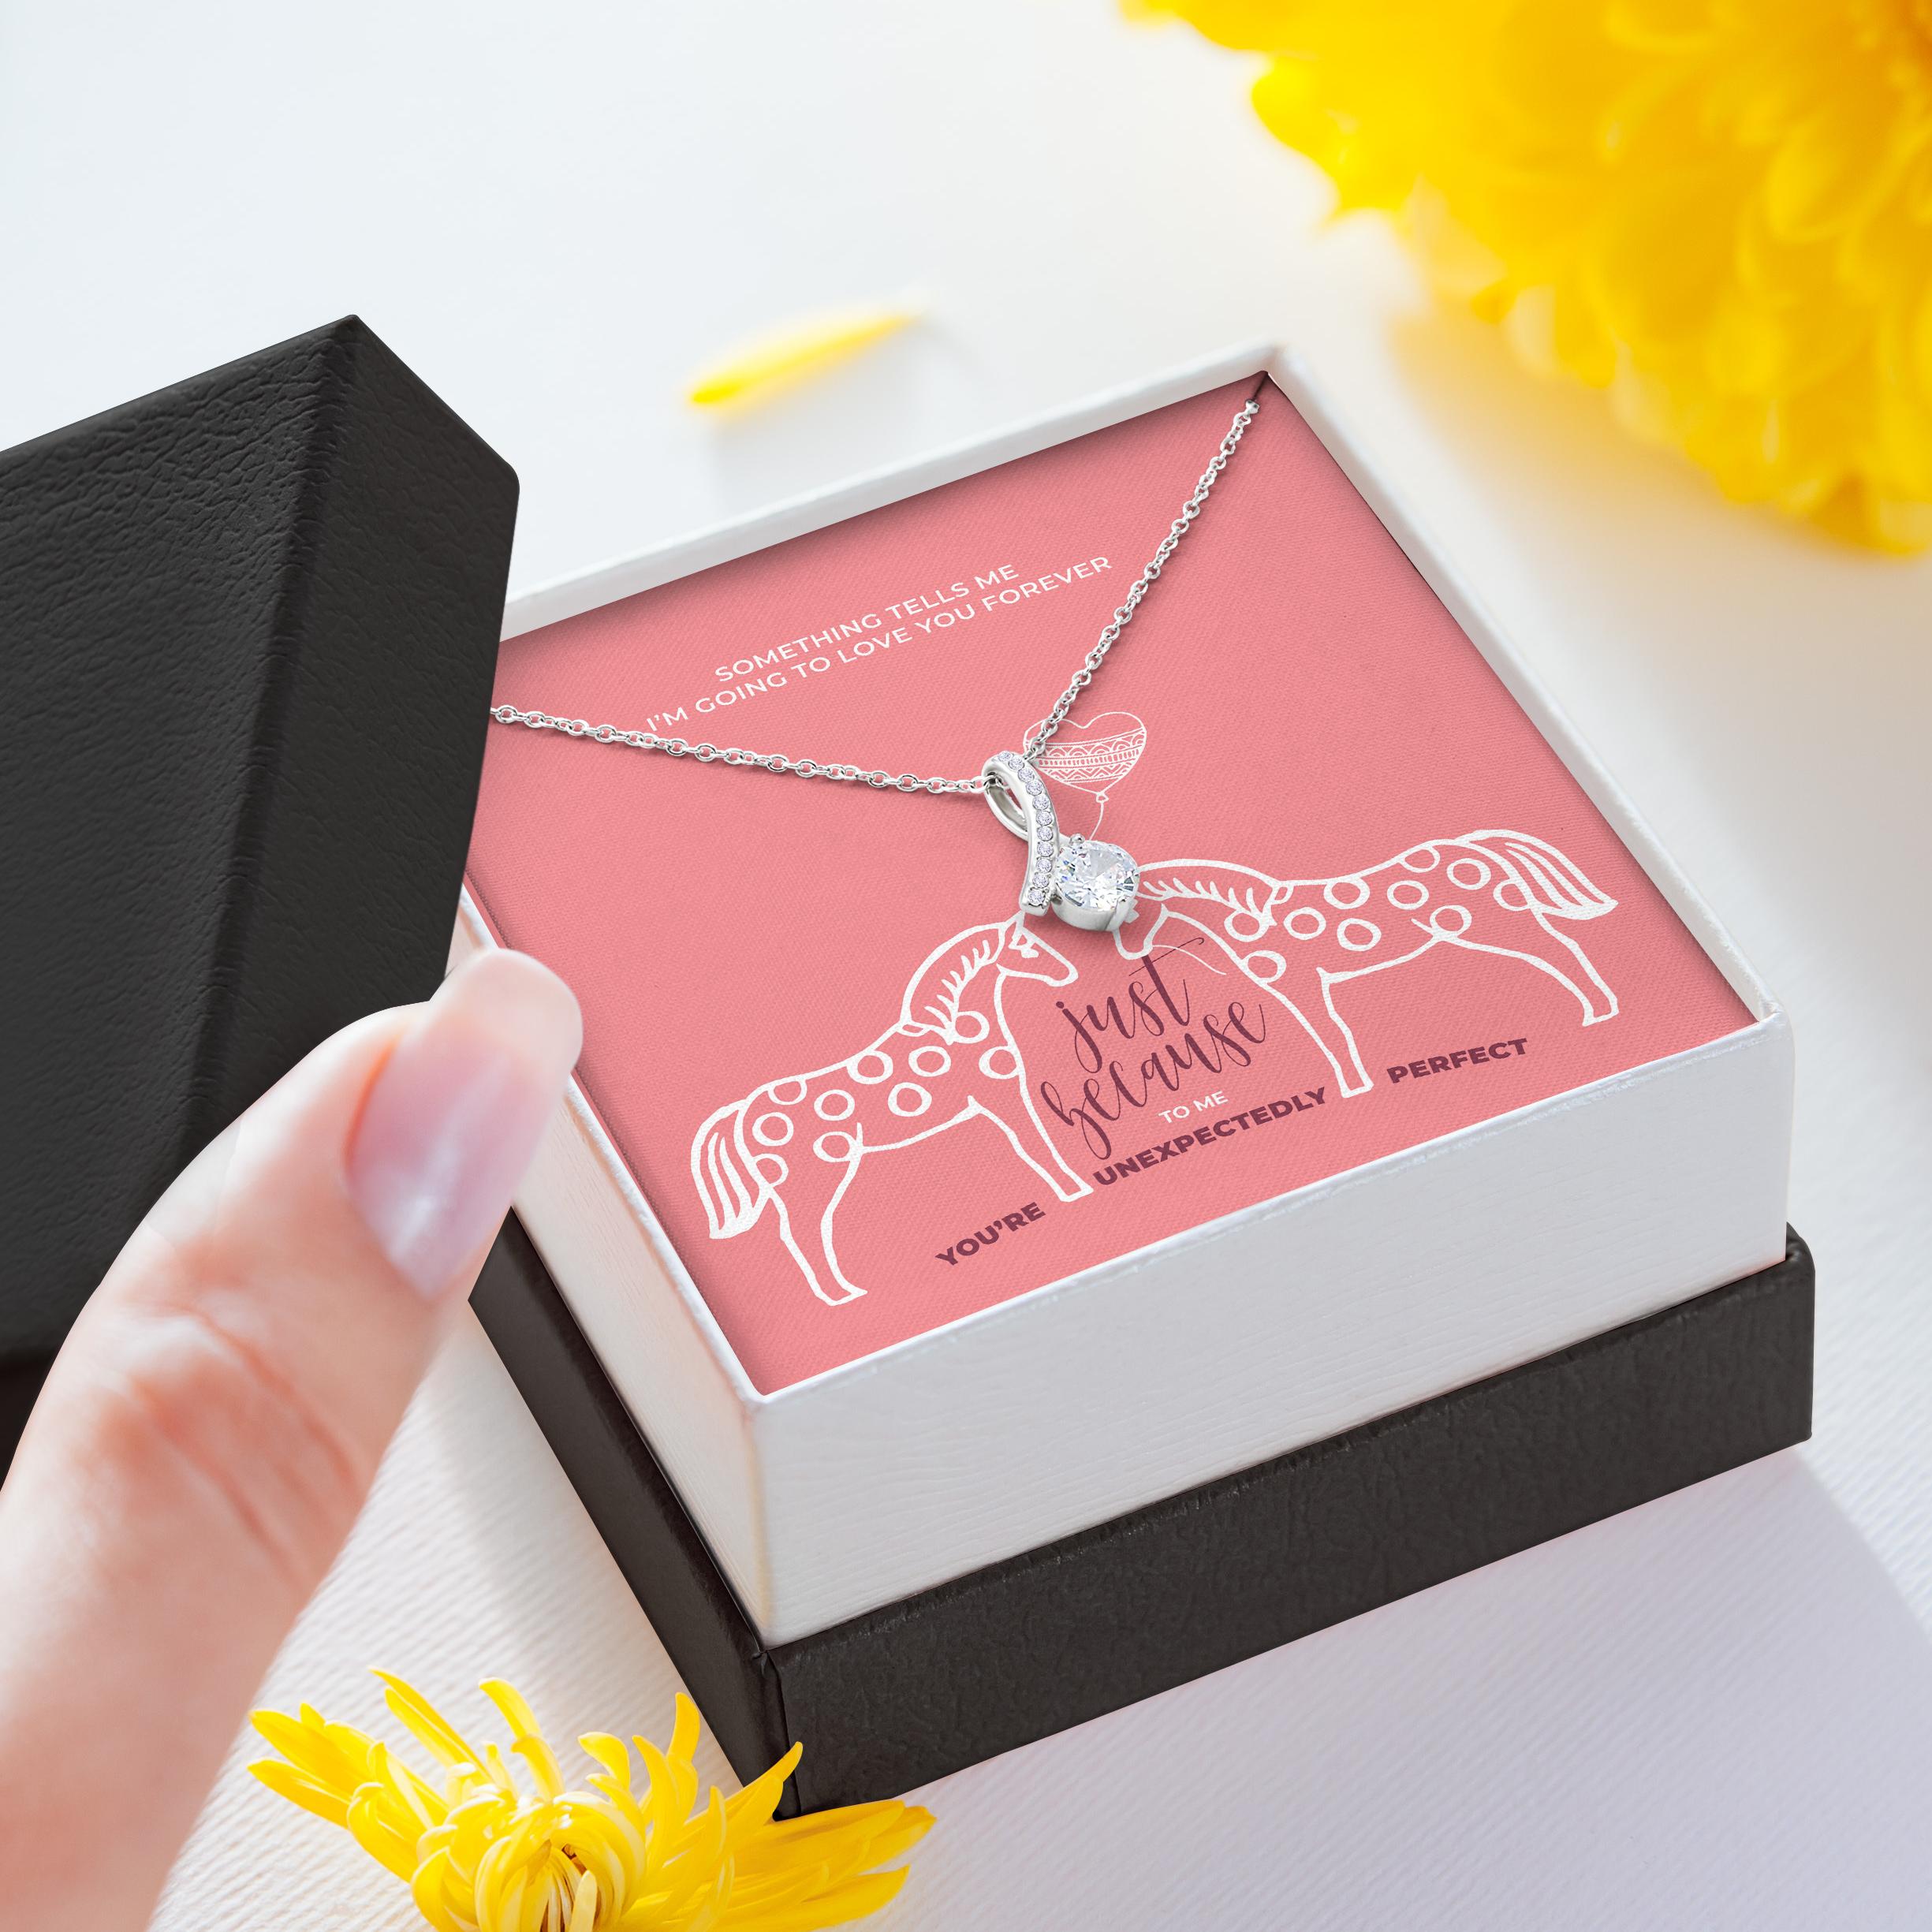 Girlfriend Necklace Gift Ideas